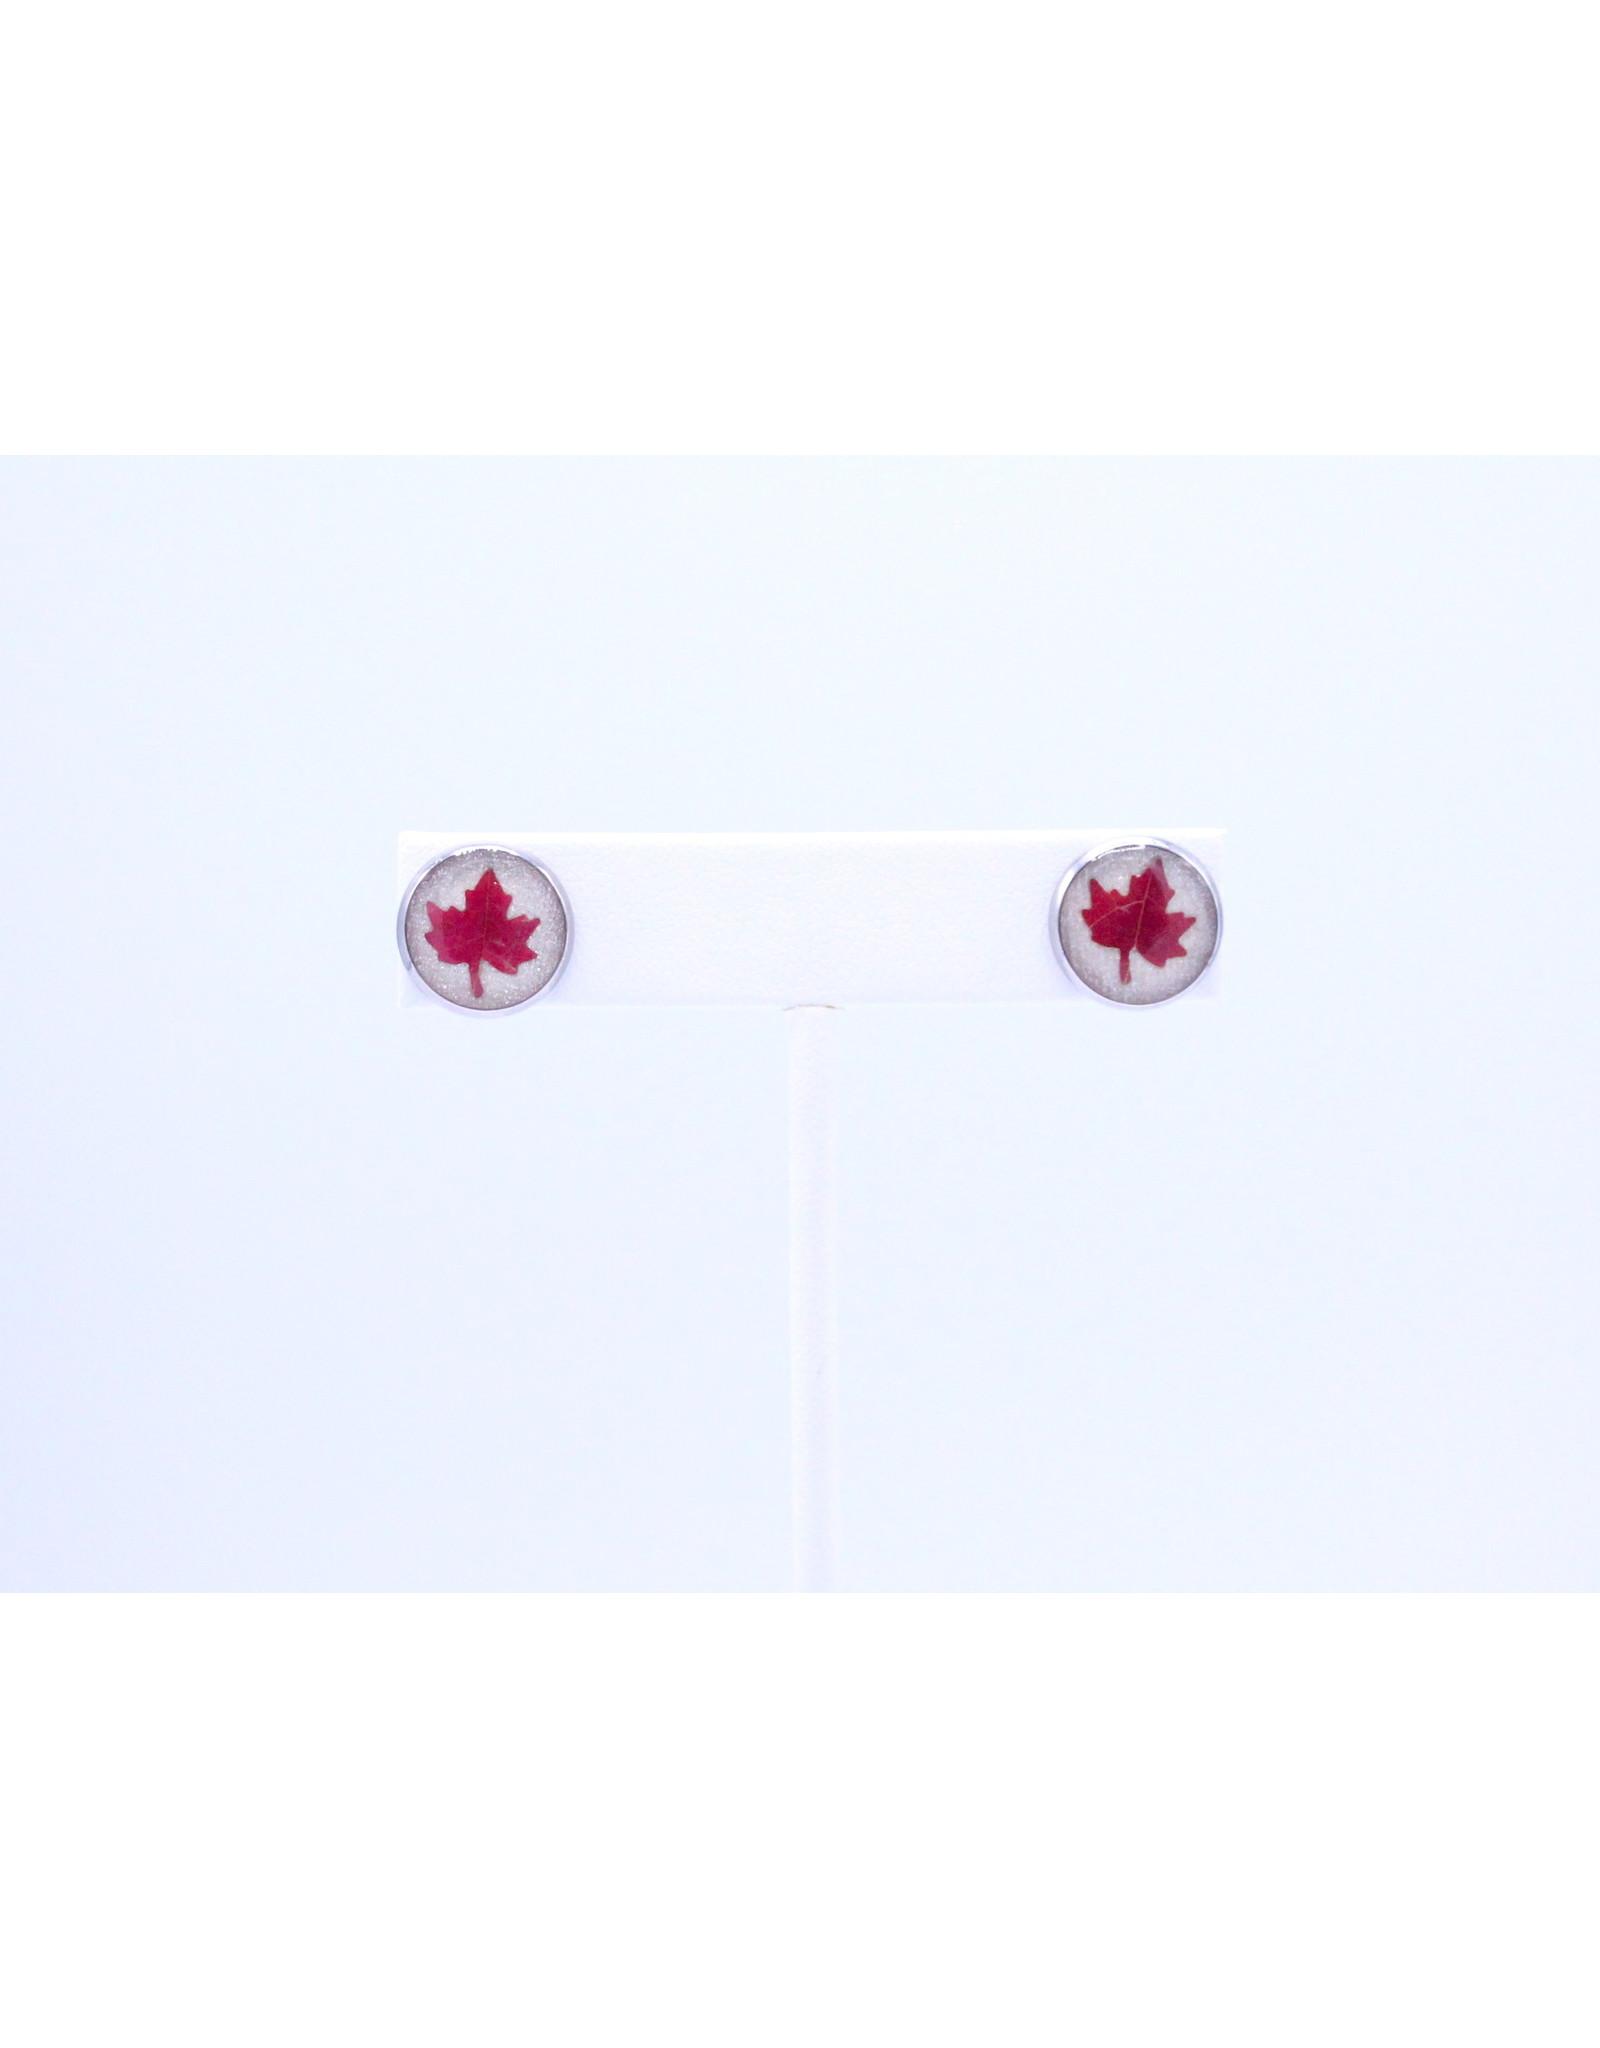 12mm Stud Maple Leaf Earrings White - J12SMLW1